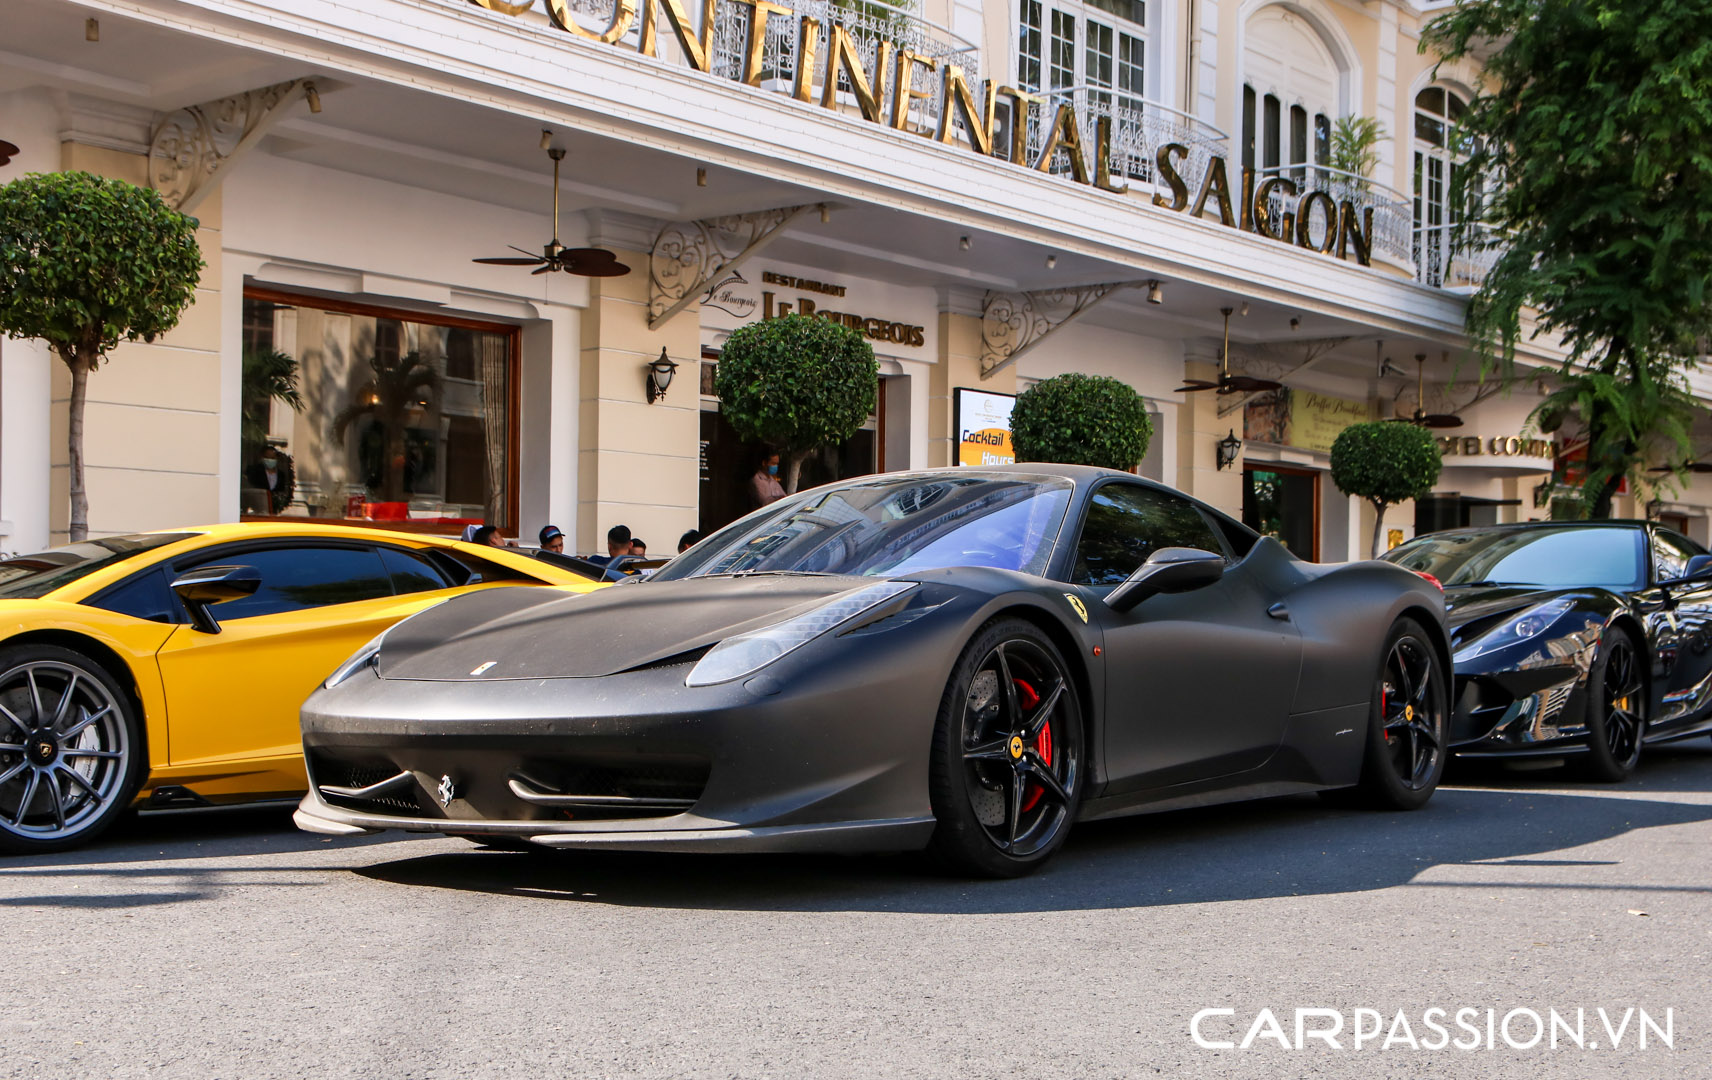 Ferrari 458 Italia đen mờ1.JPG